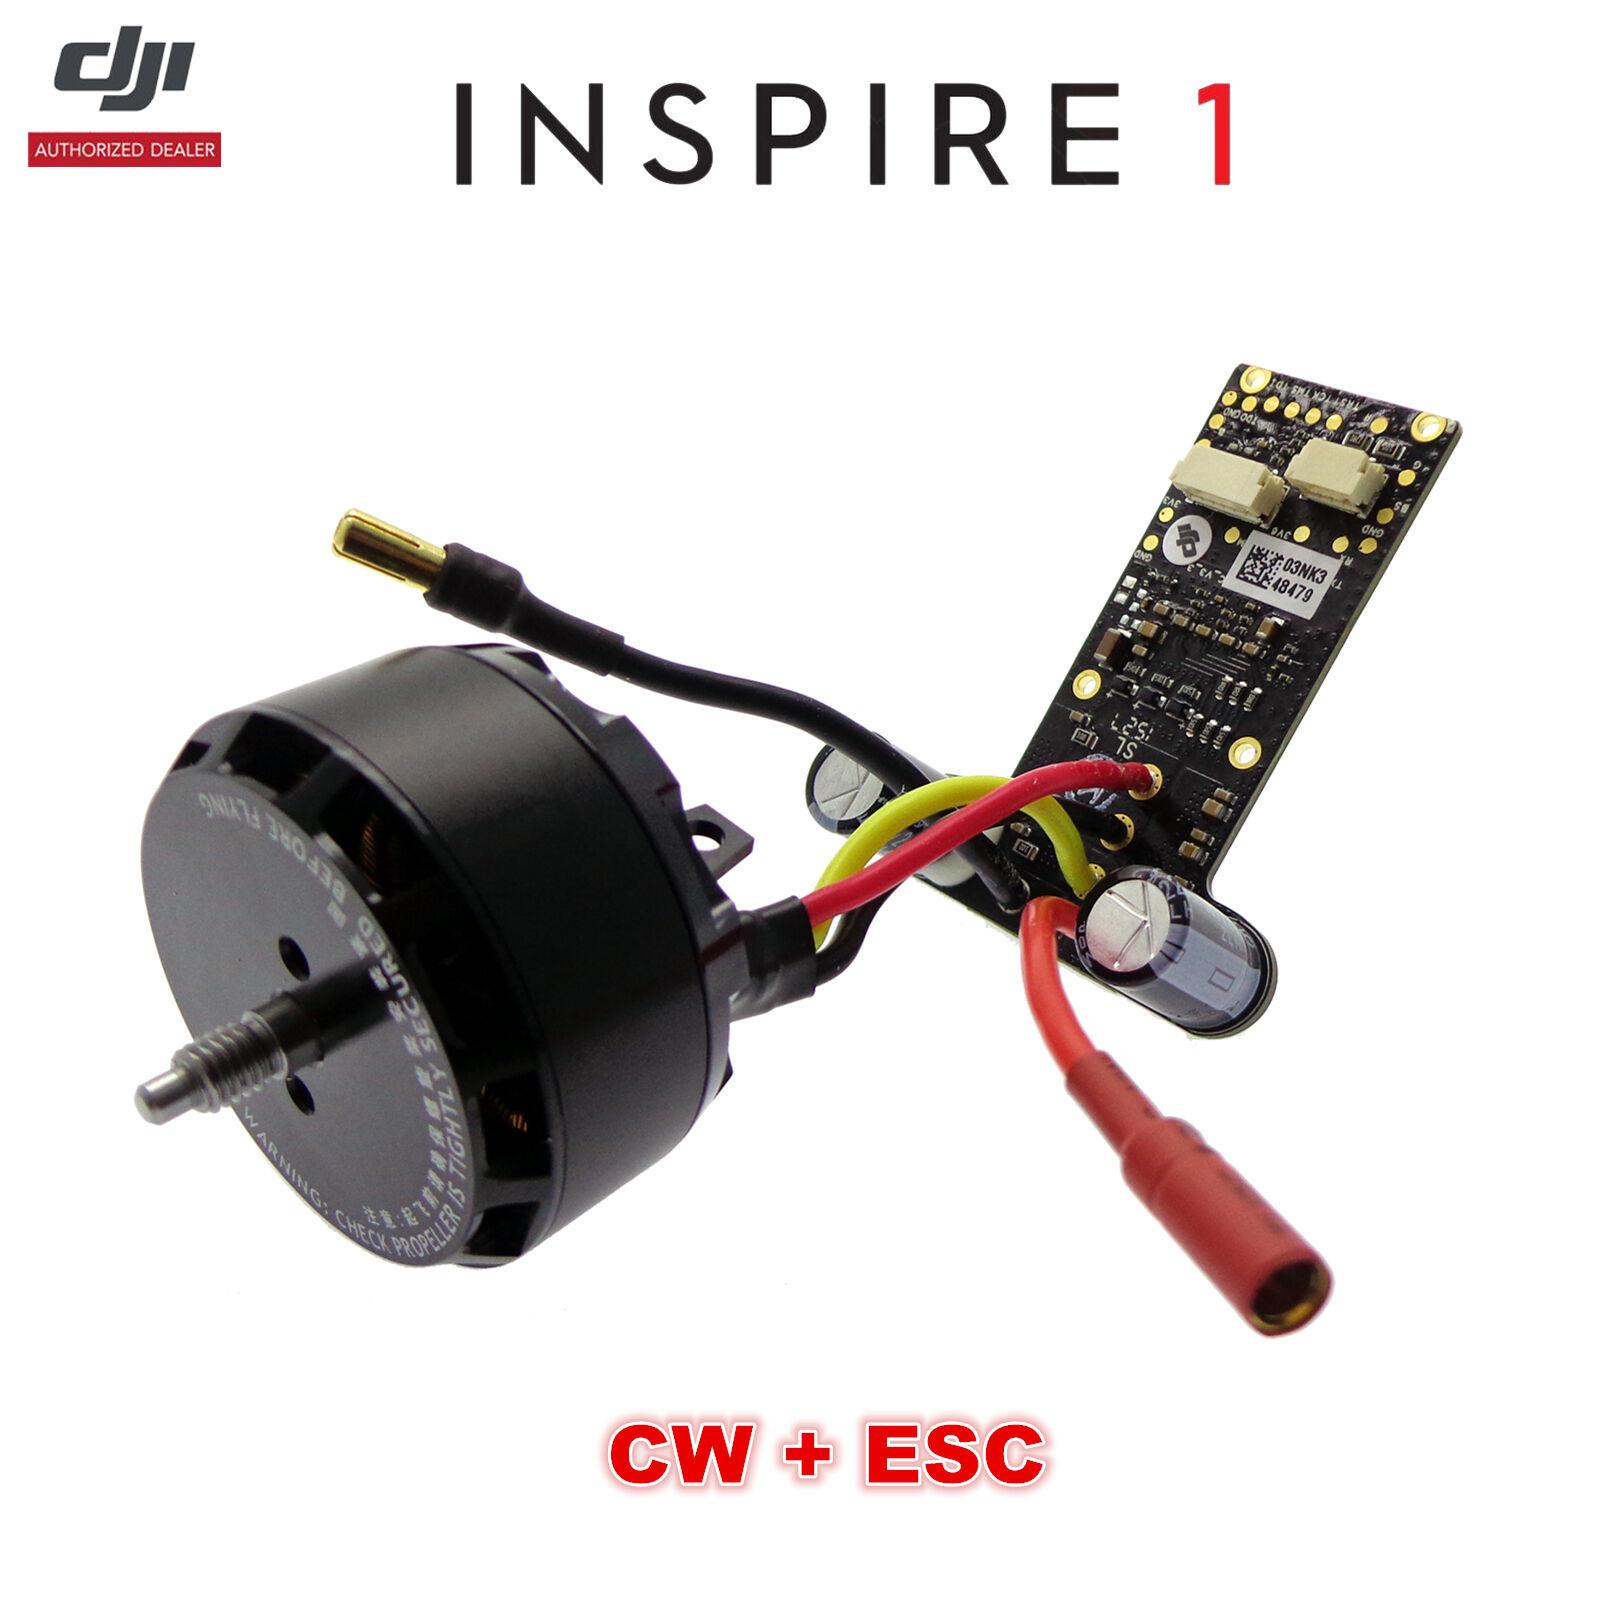 DJI Inspire 1 Drone WM610  Part 4 3510 350KV Brushless CW Motor, ESC Components